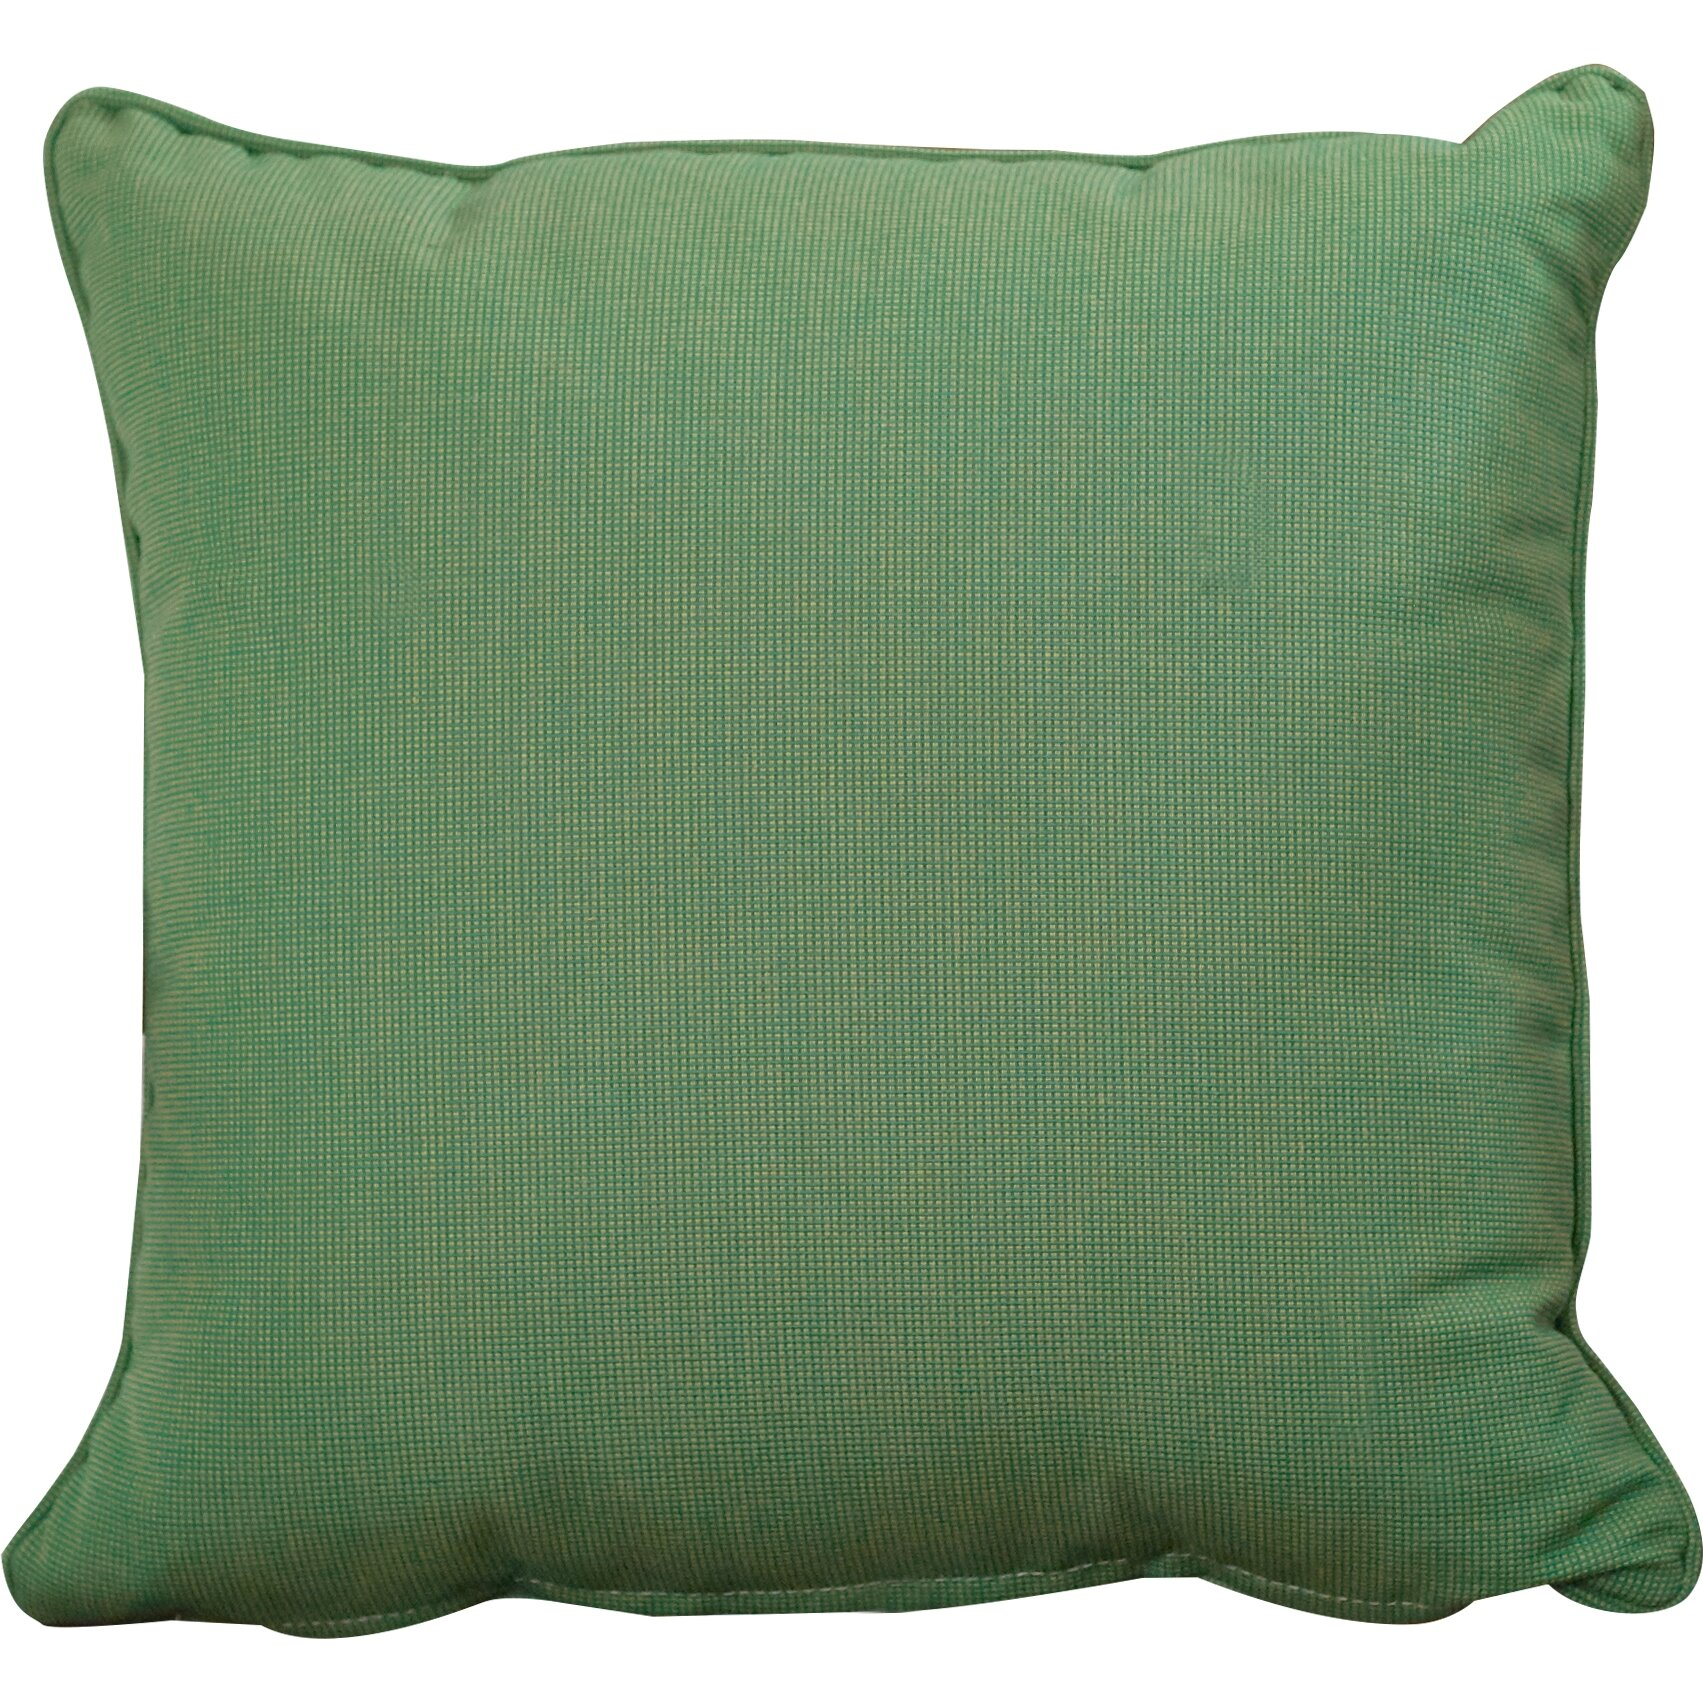 Custom Sunbrella Throw Pillows : Wayfair Custom Outdoor Cushions Outdoor Sunbrella Throw Pillow & Reviews Wayfair